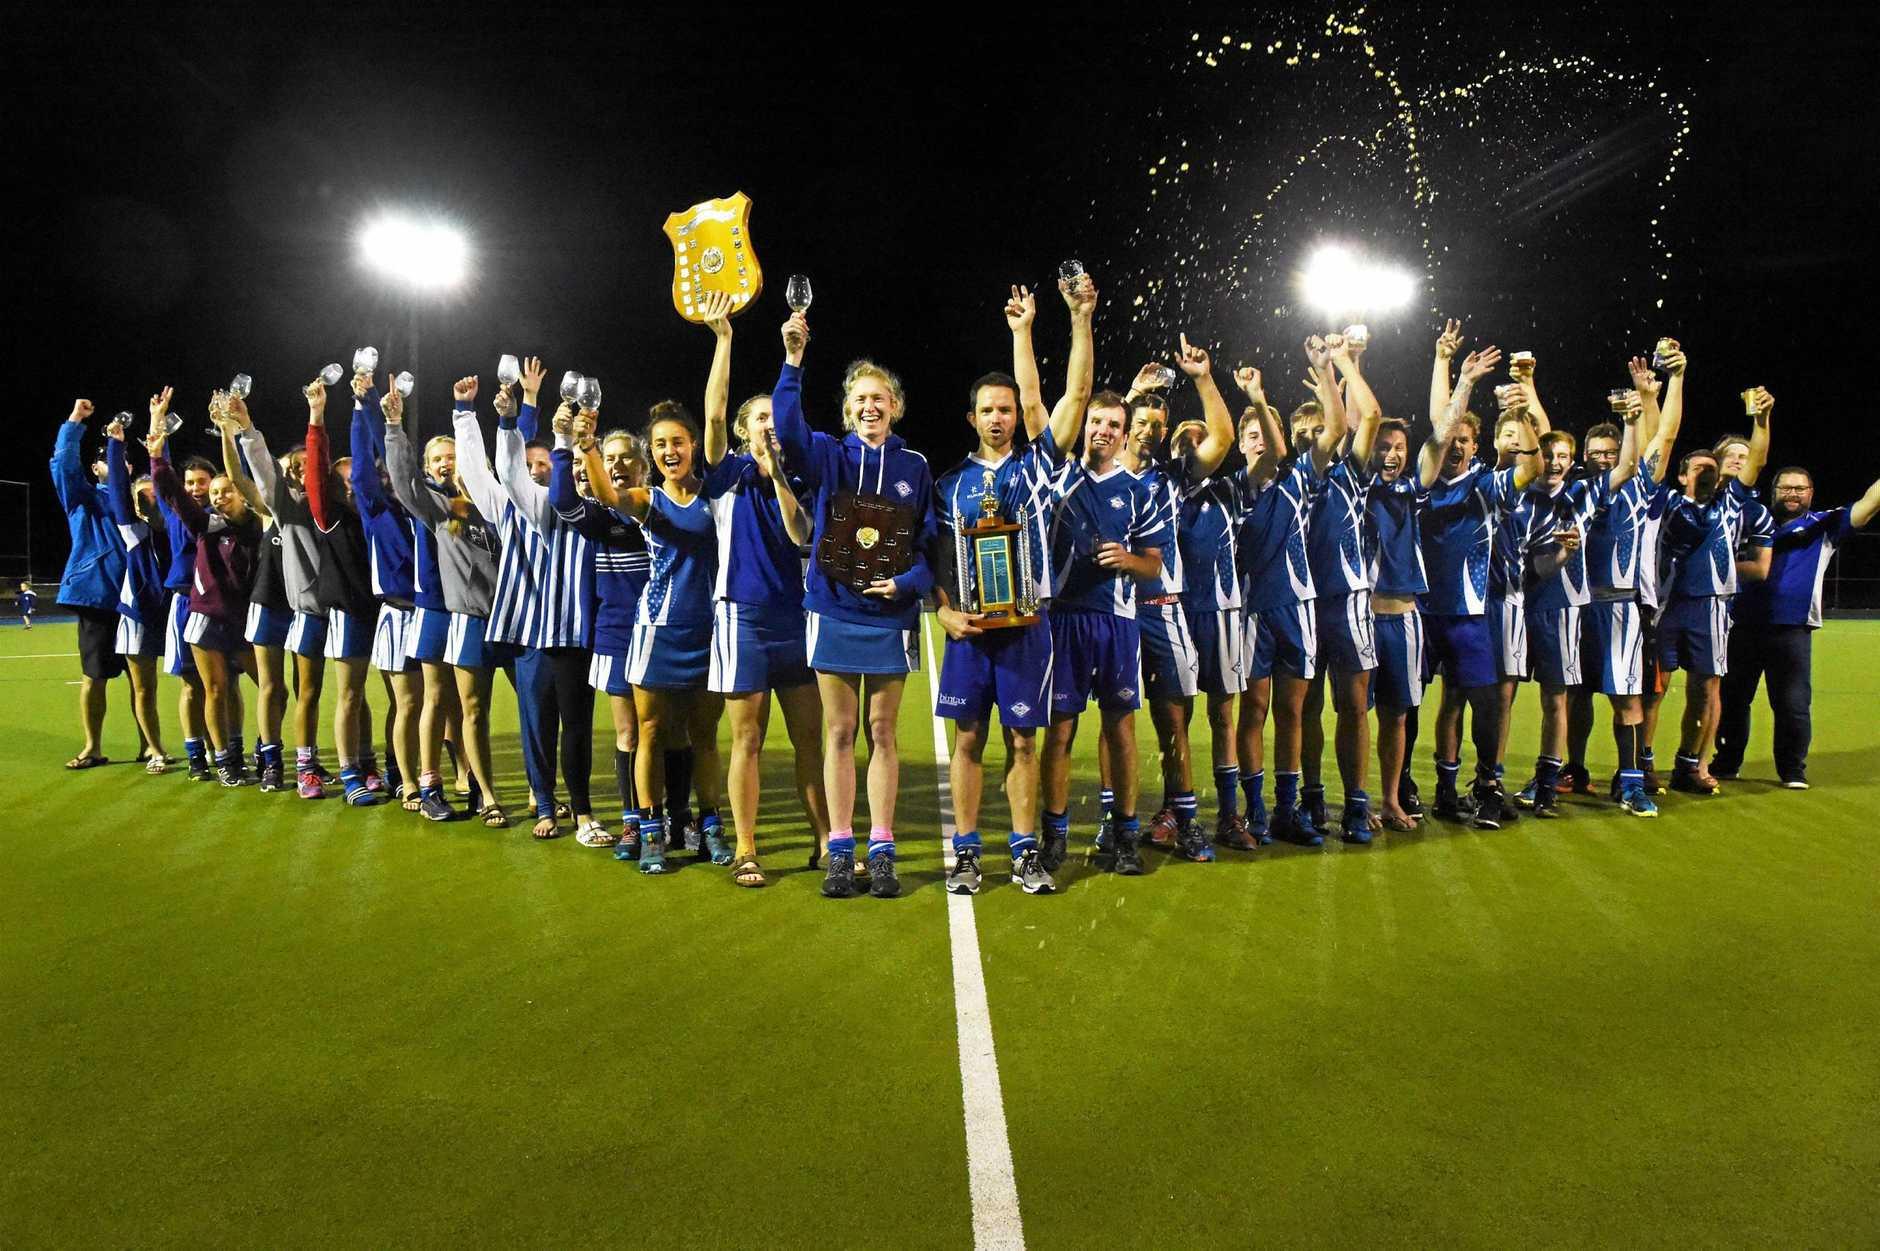 THE DOUBLE: Wallaroos men and women celebrating winning both major premierships in 2018.